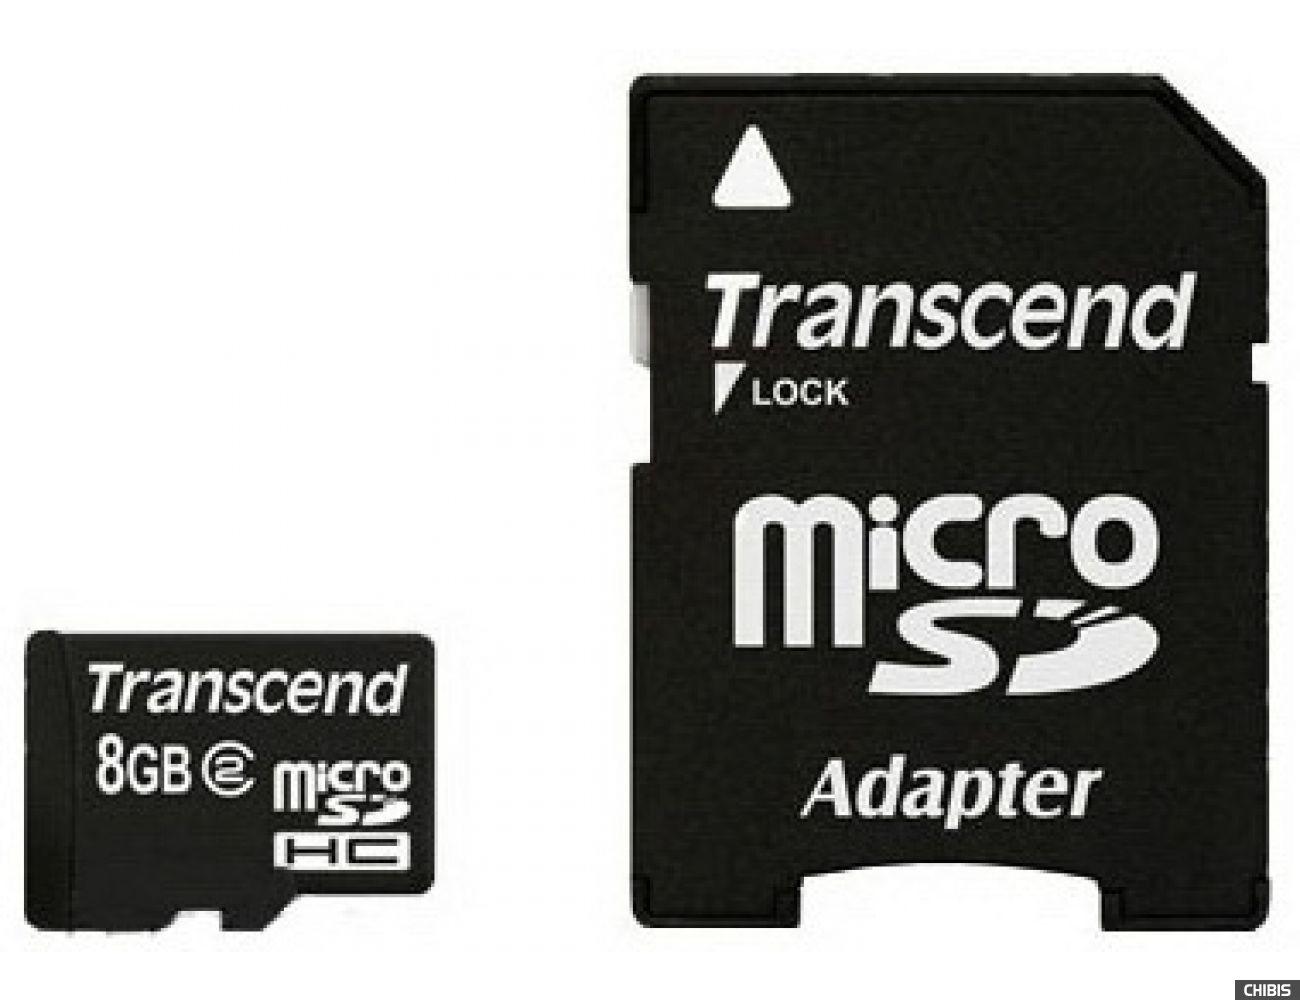 Карта памяти Transcend MicroSDHC 8Gb (Class 2) + CardReader